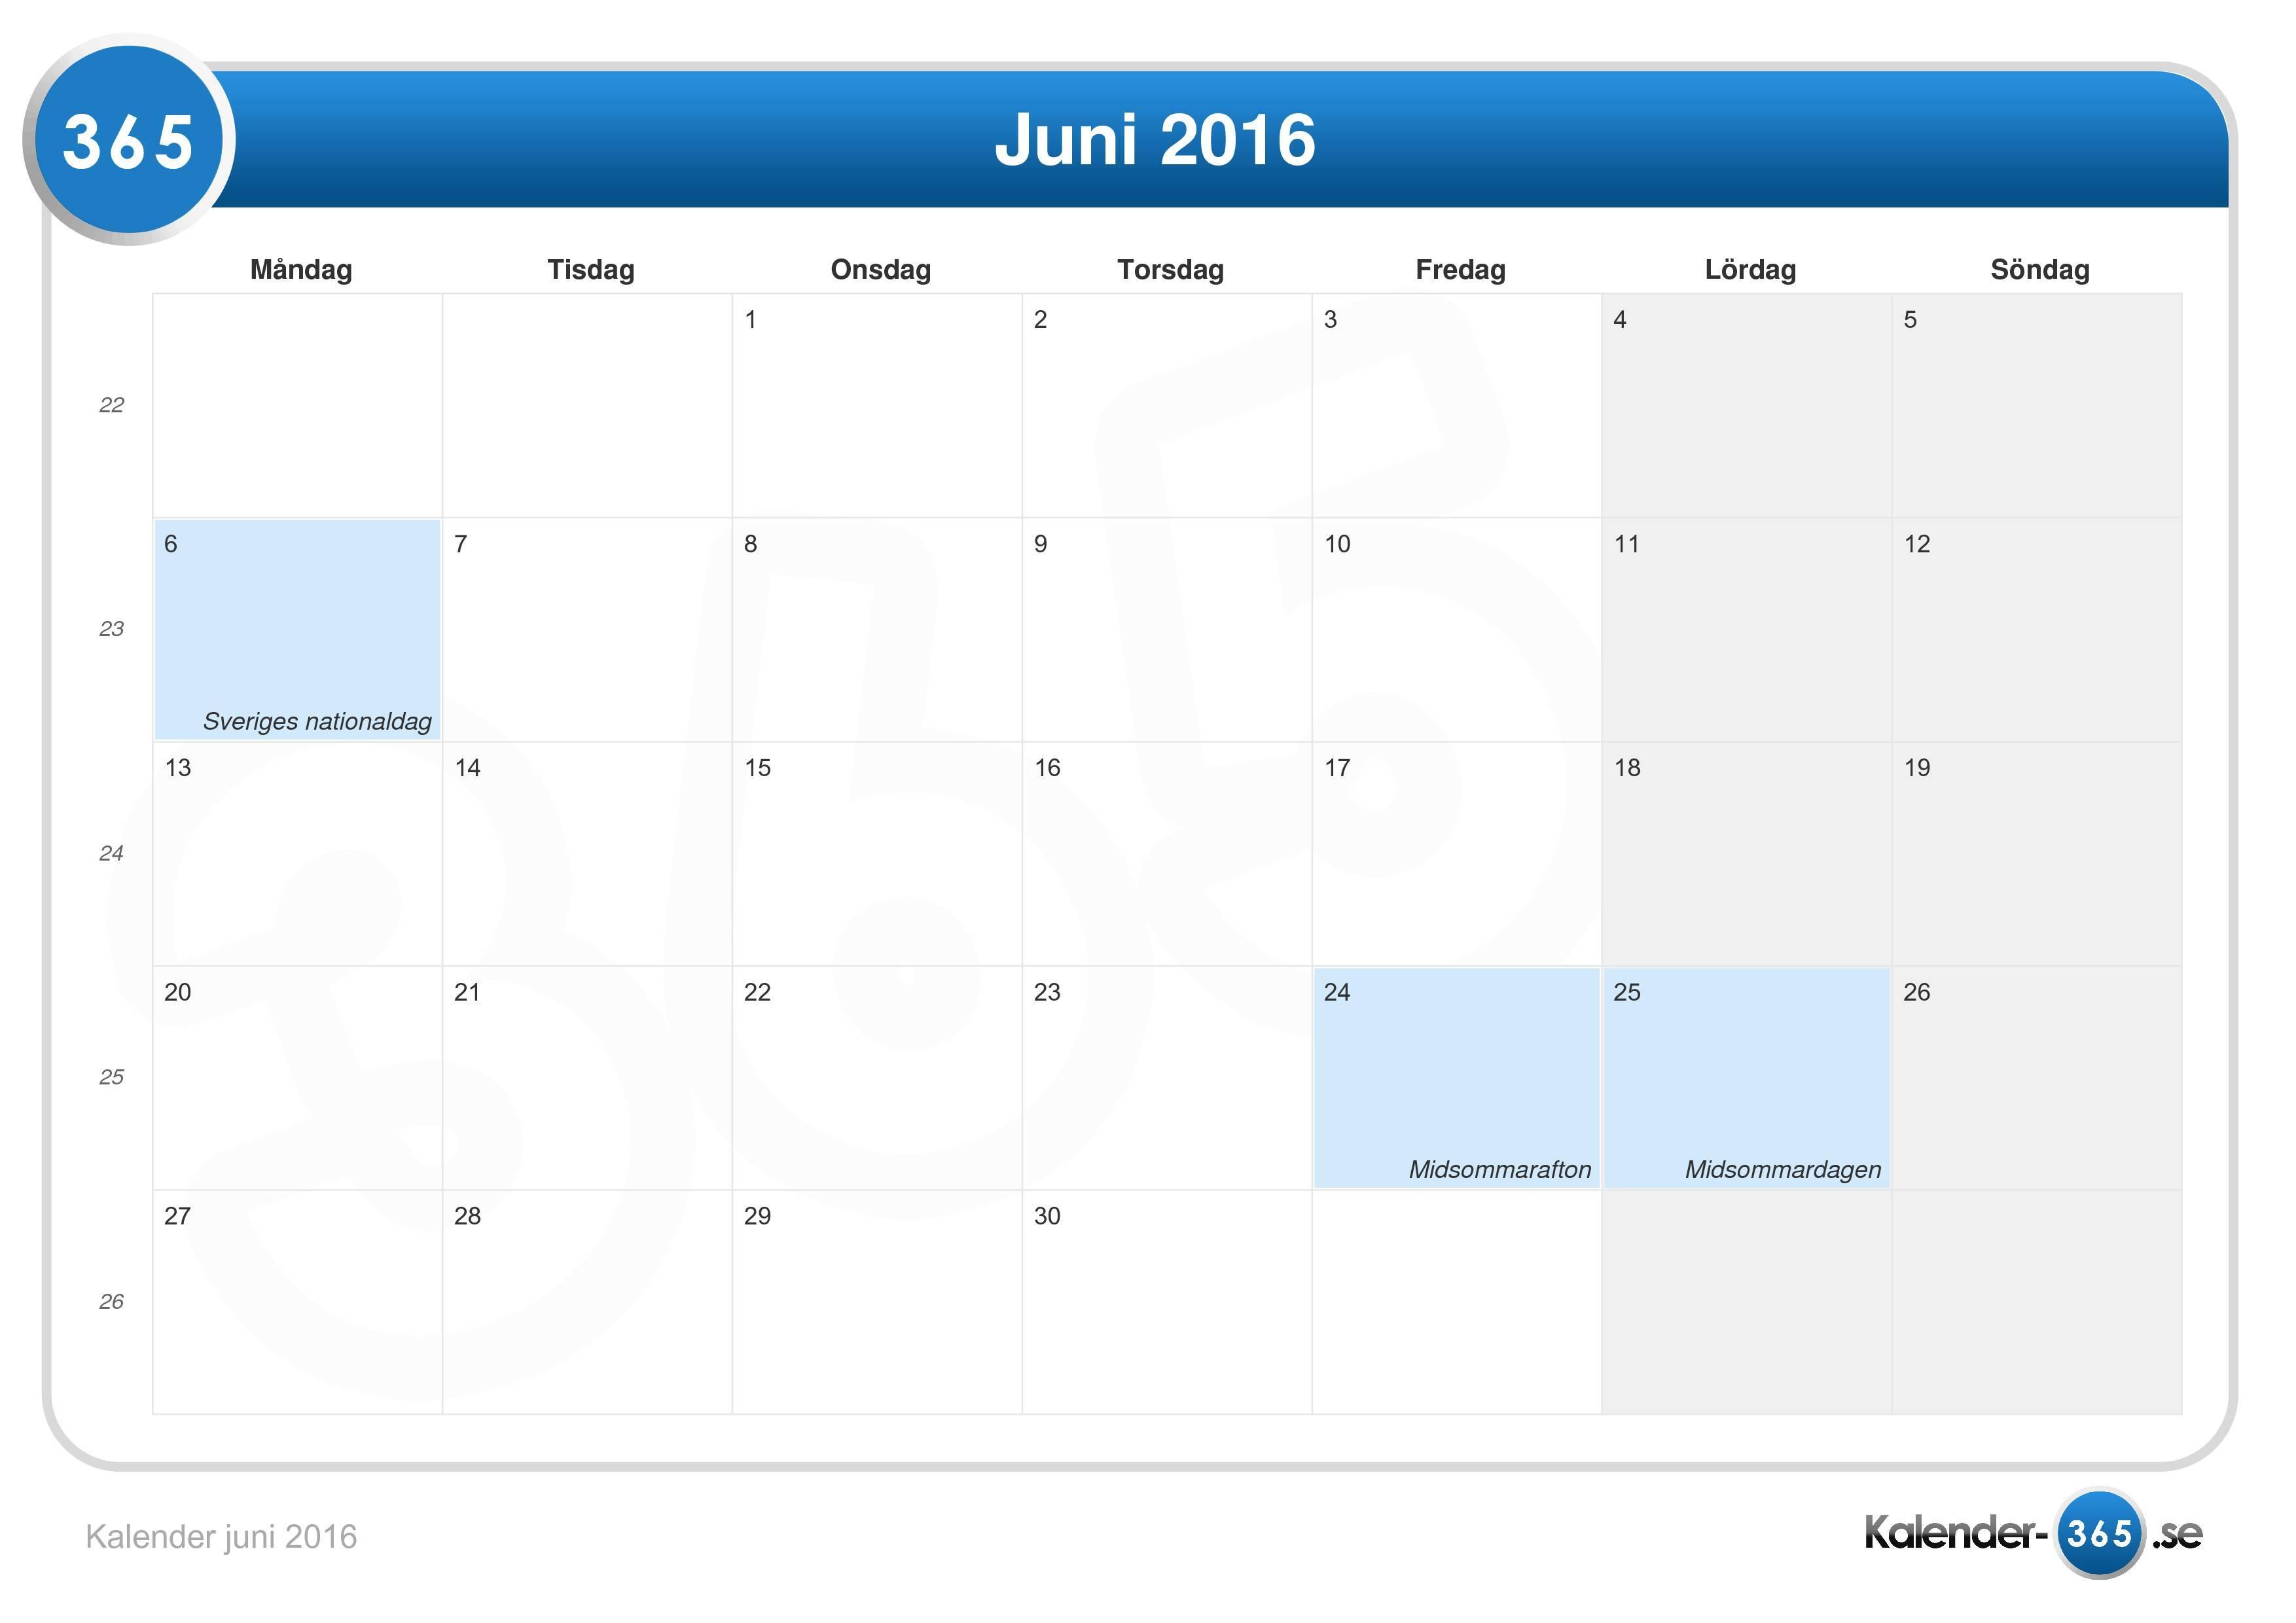 Kalender juni 2016